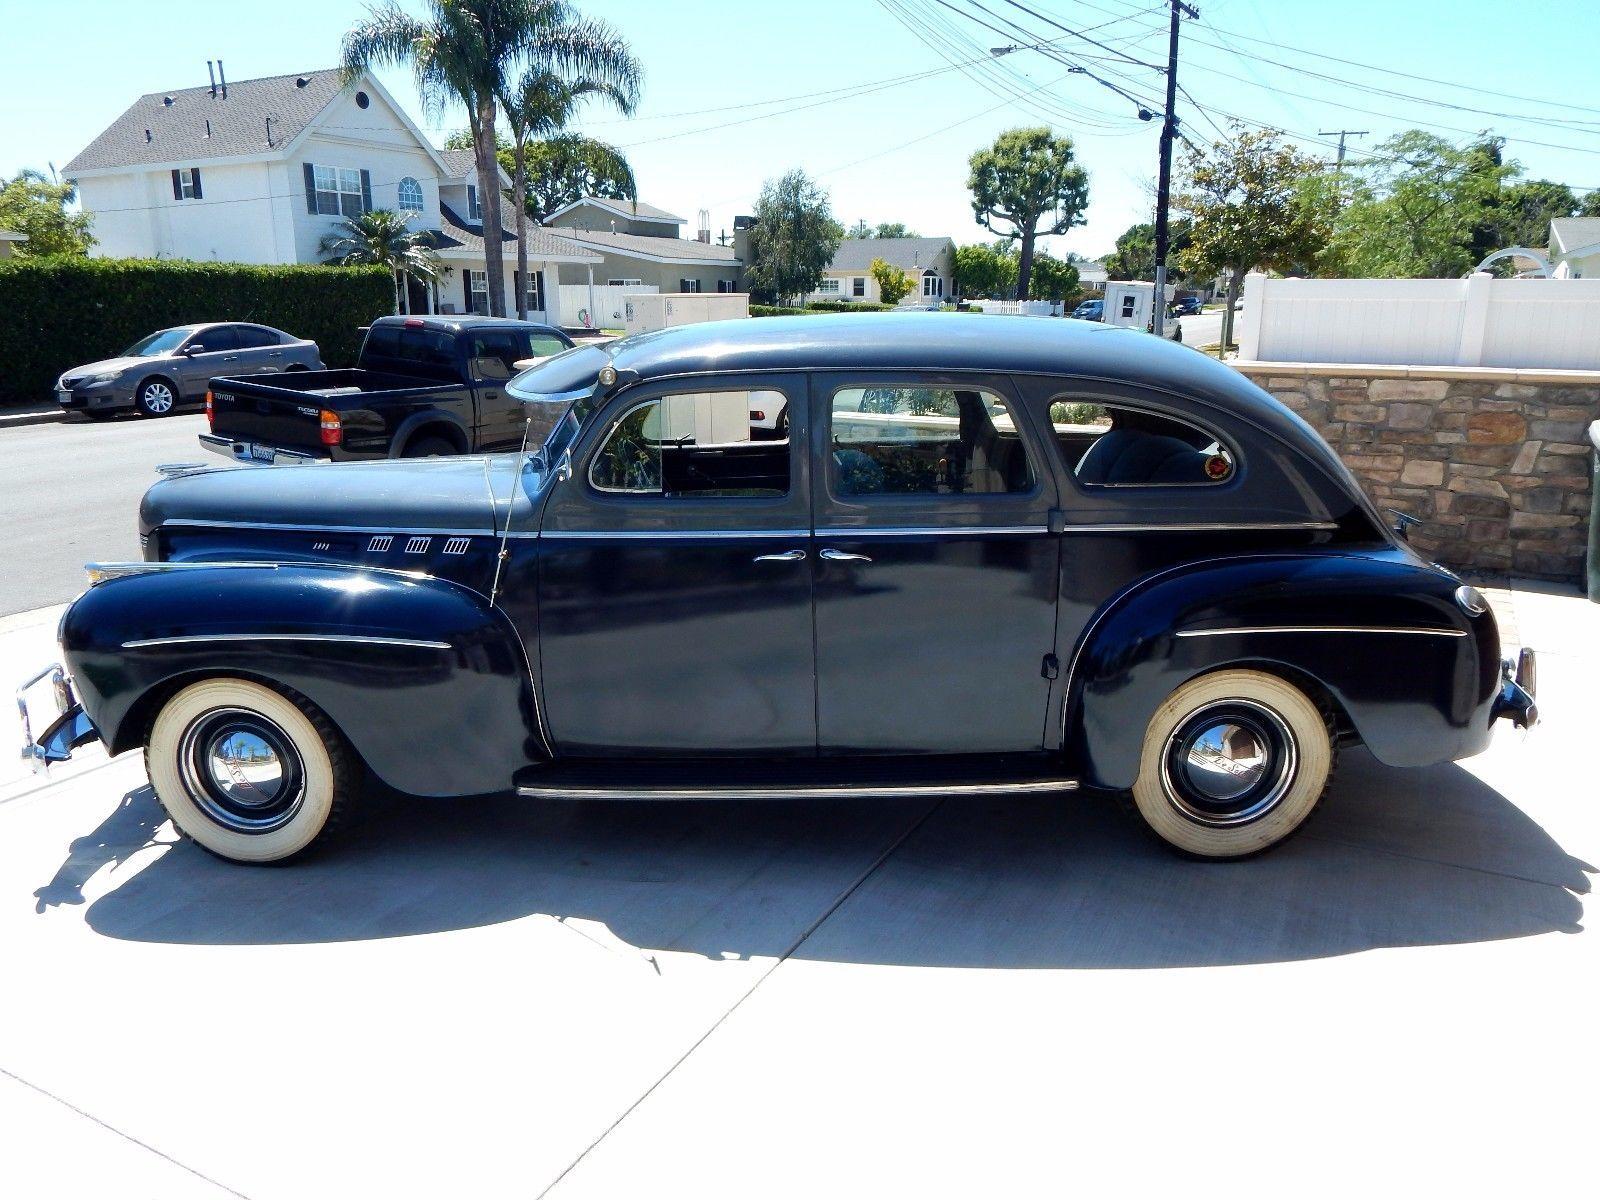 1940 DeSoto Sportsman Pre-War Mid-Year Sedan   Sedans, Motor car and ...